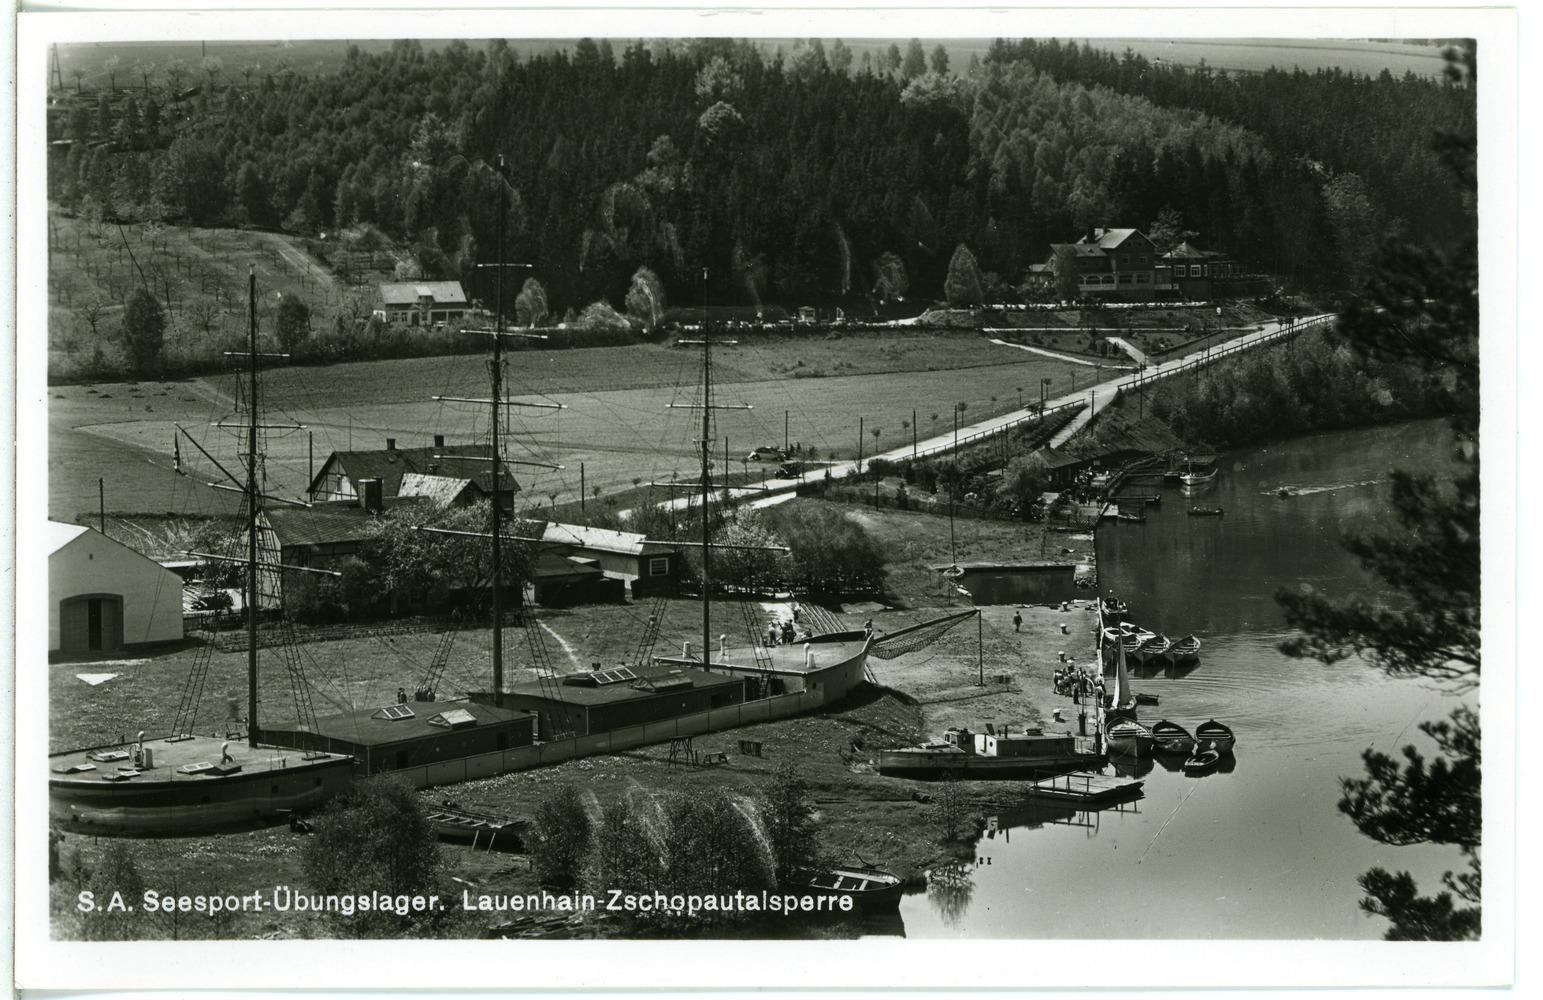 File:27255-Lauenhain-1938-Zschopau-Talsperre - Seesport Übungslager-Brück